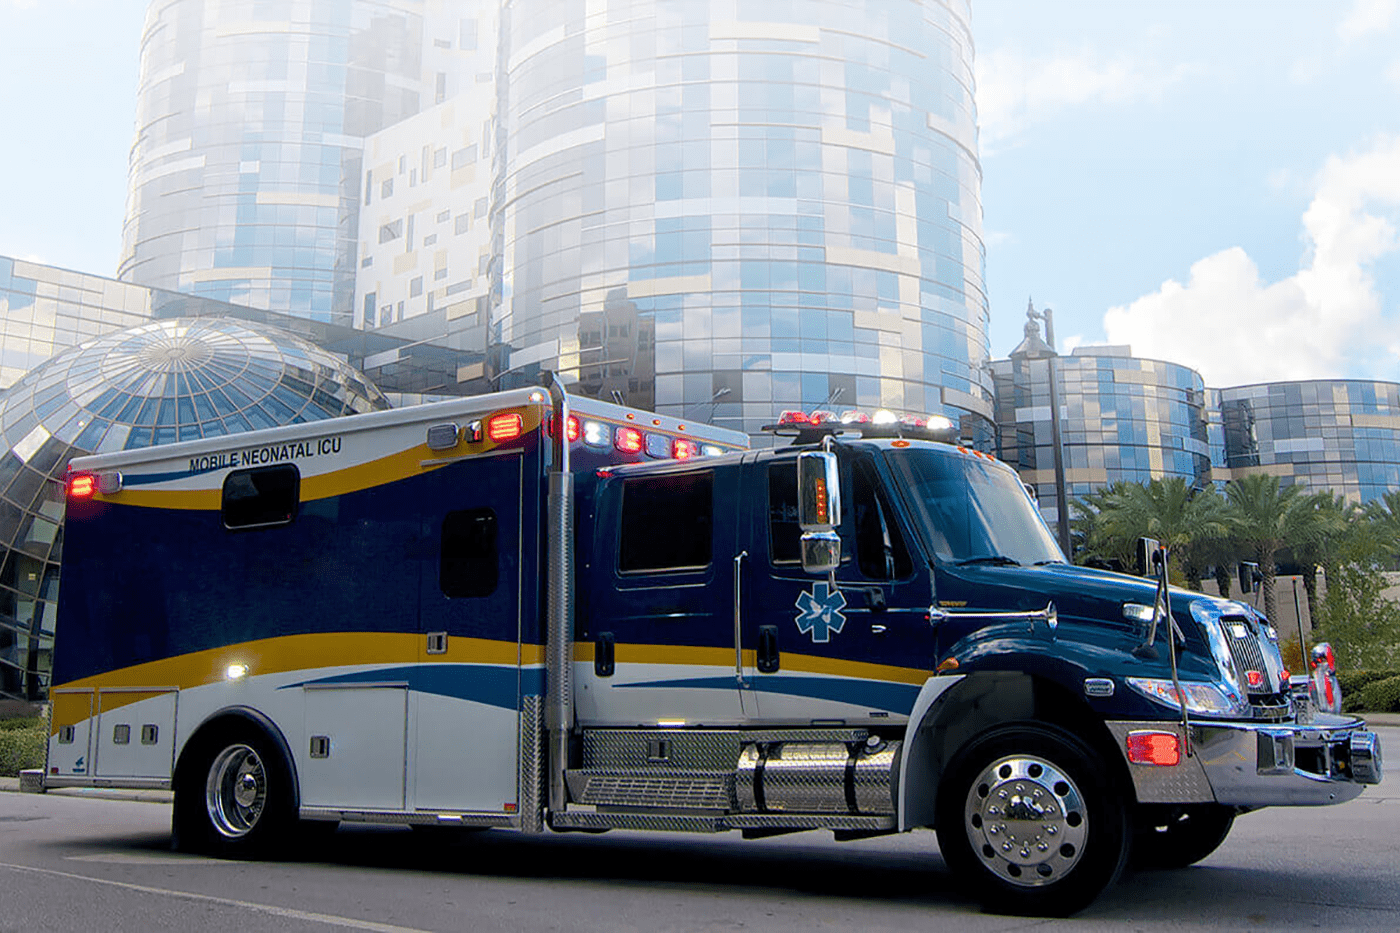 AEV High-Risk Ambulance